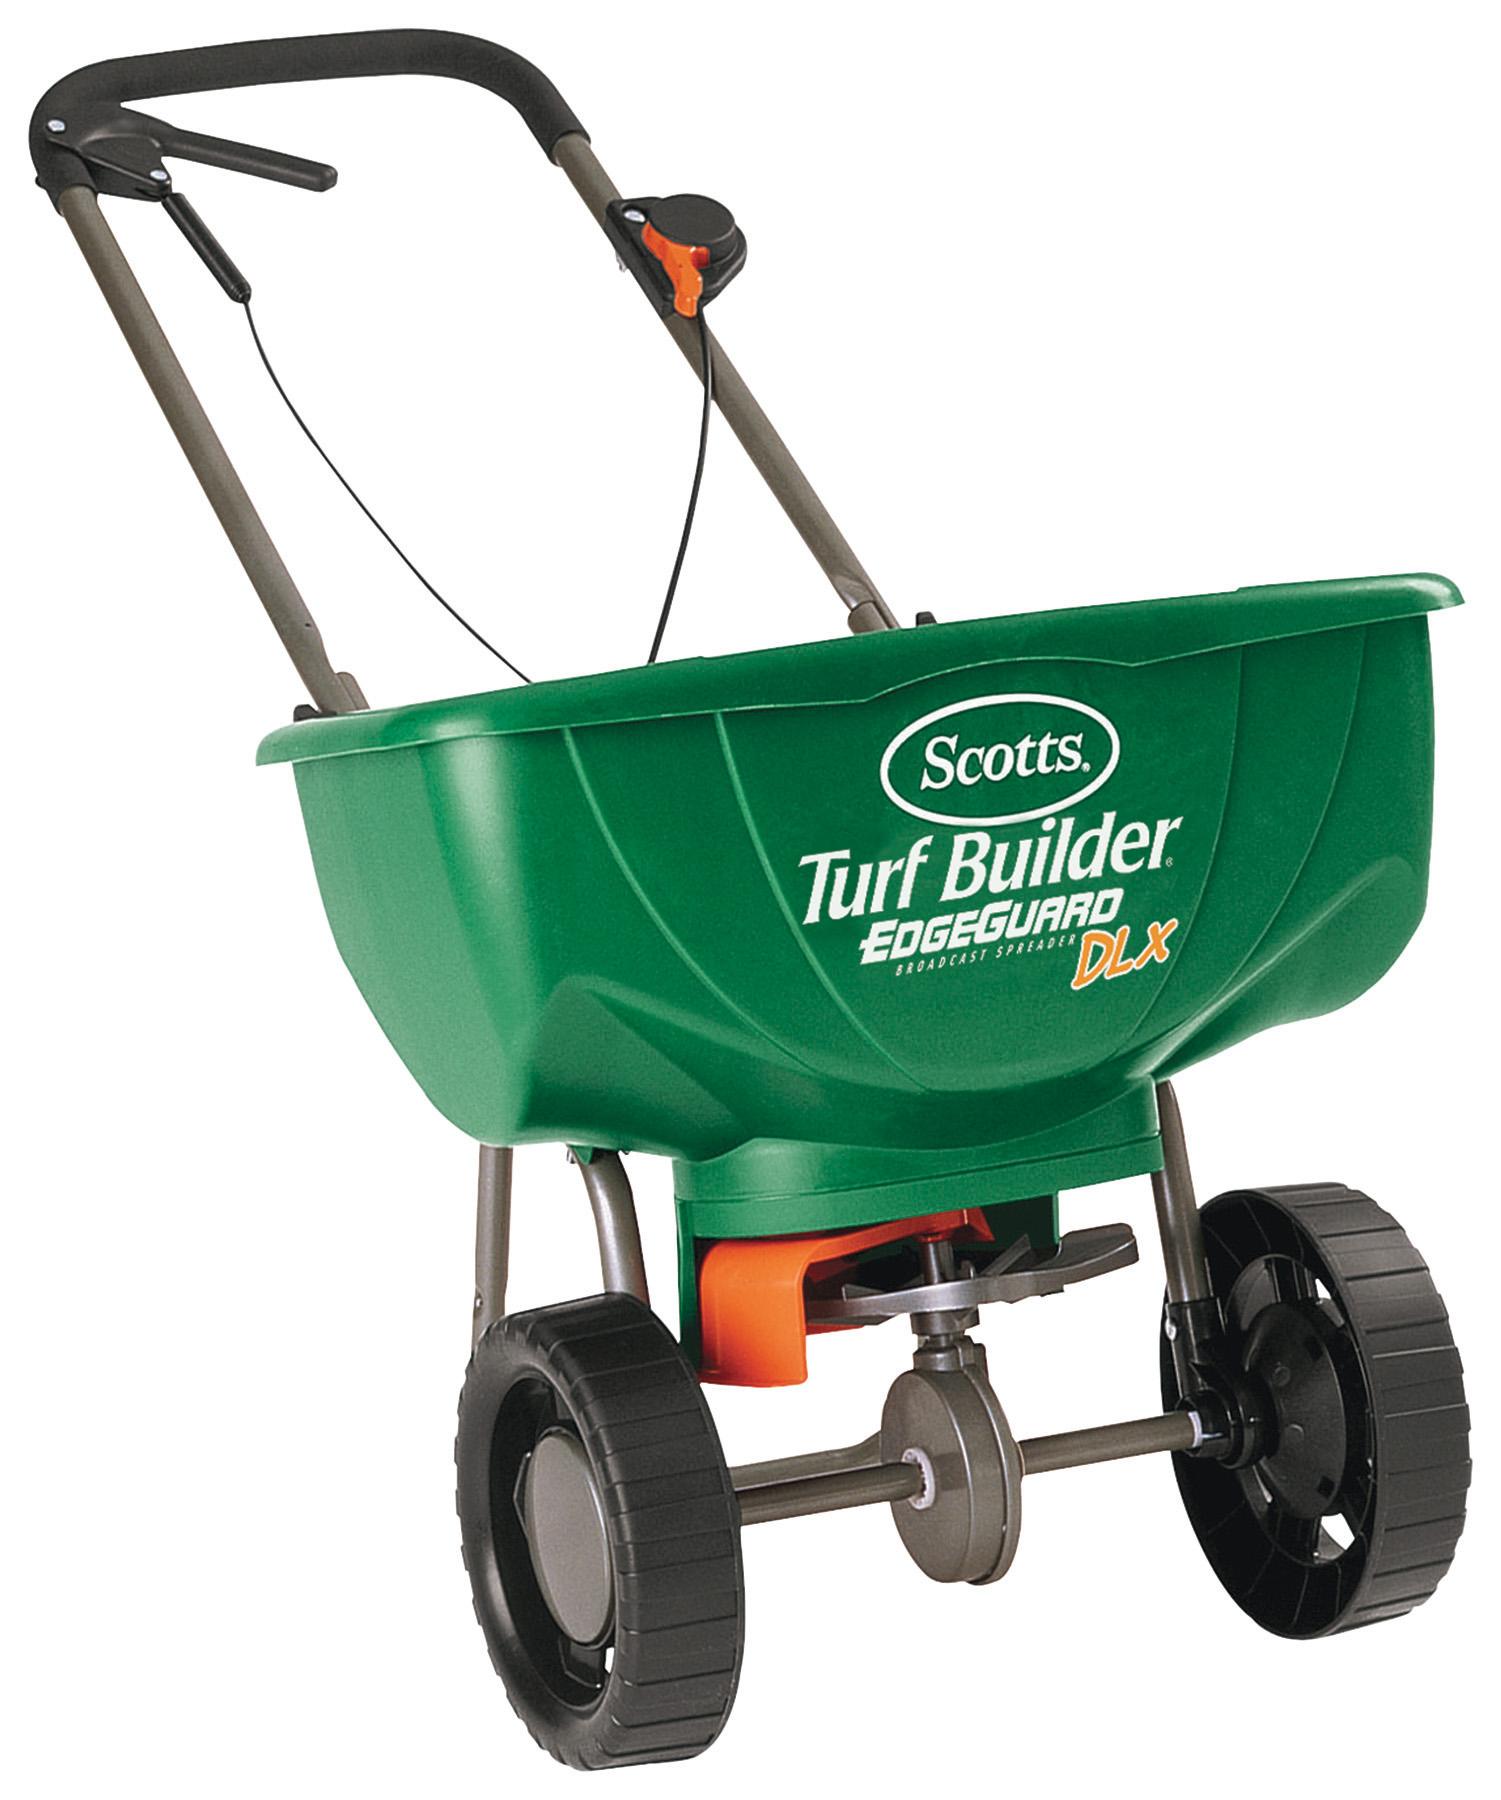 Scotts Turf Builder EdgeGuard DLX Broadcast Spreader - Walmart.com $15.00 YMMV B&M